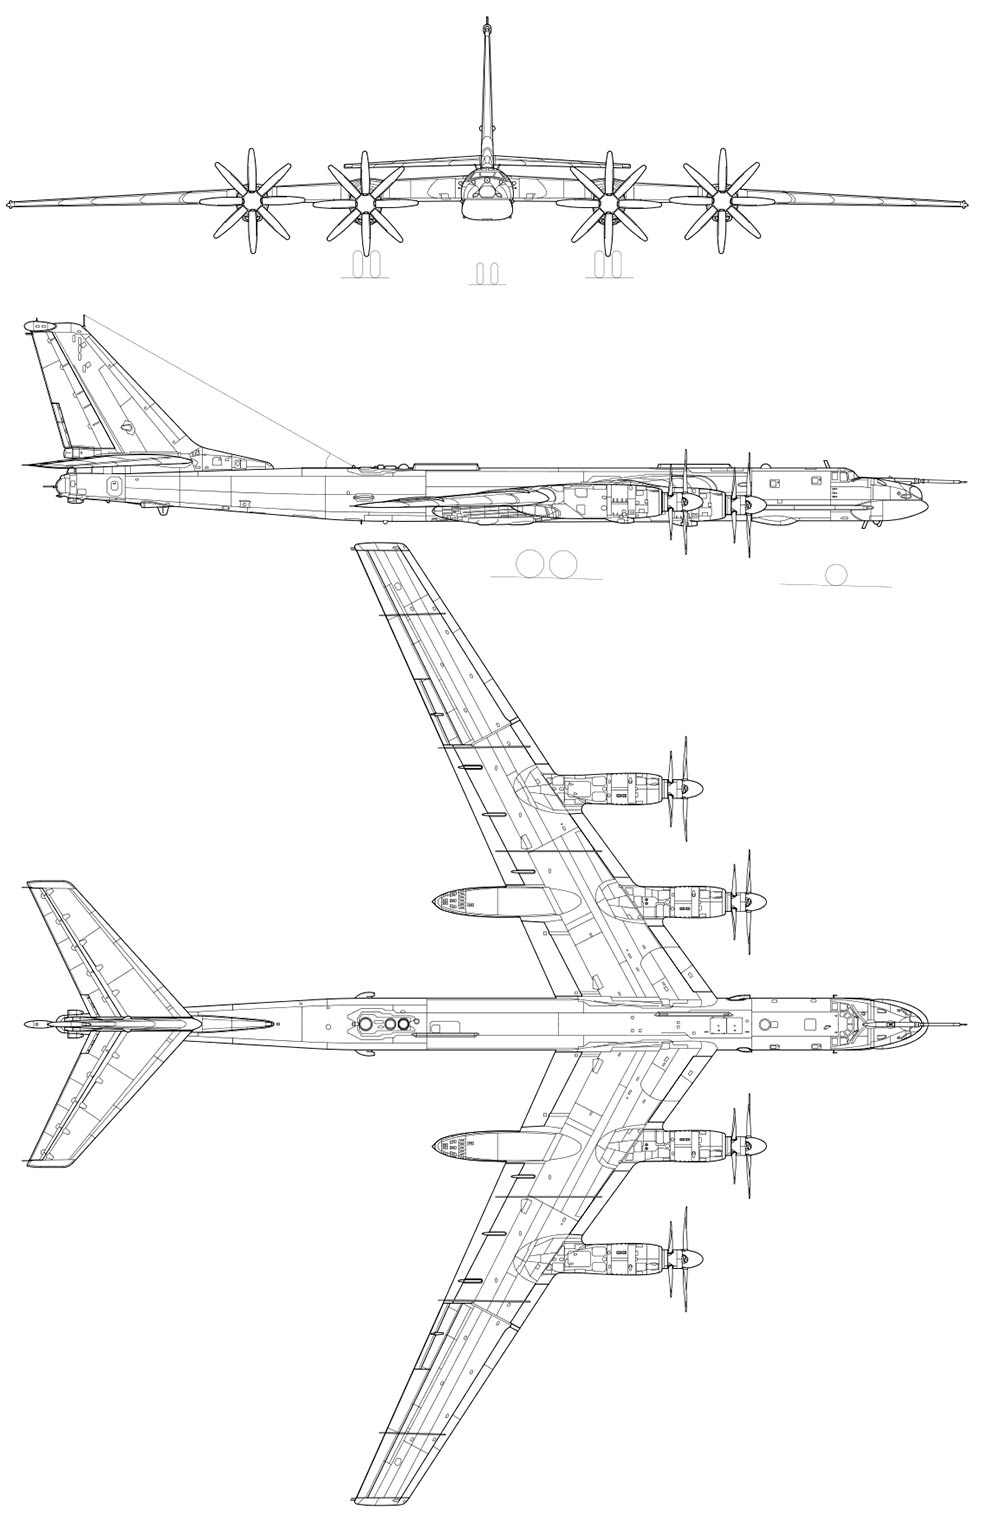 Чертеж стратегического бомбардировщика ТУ-95